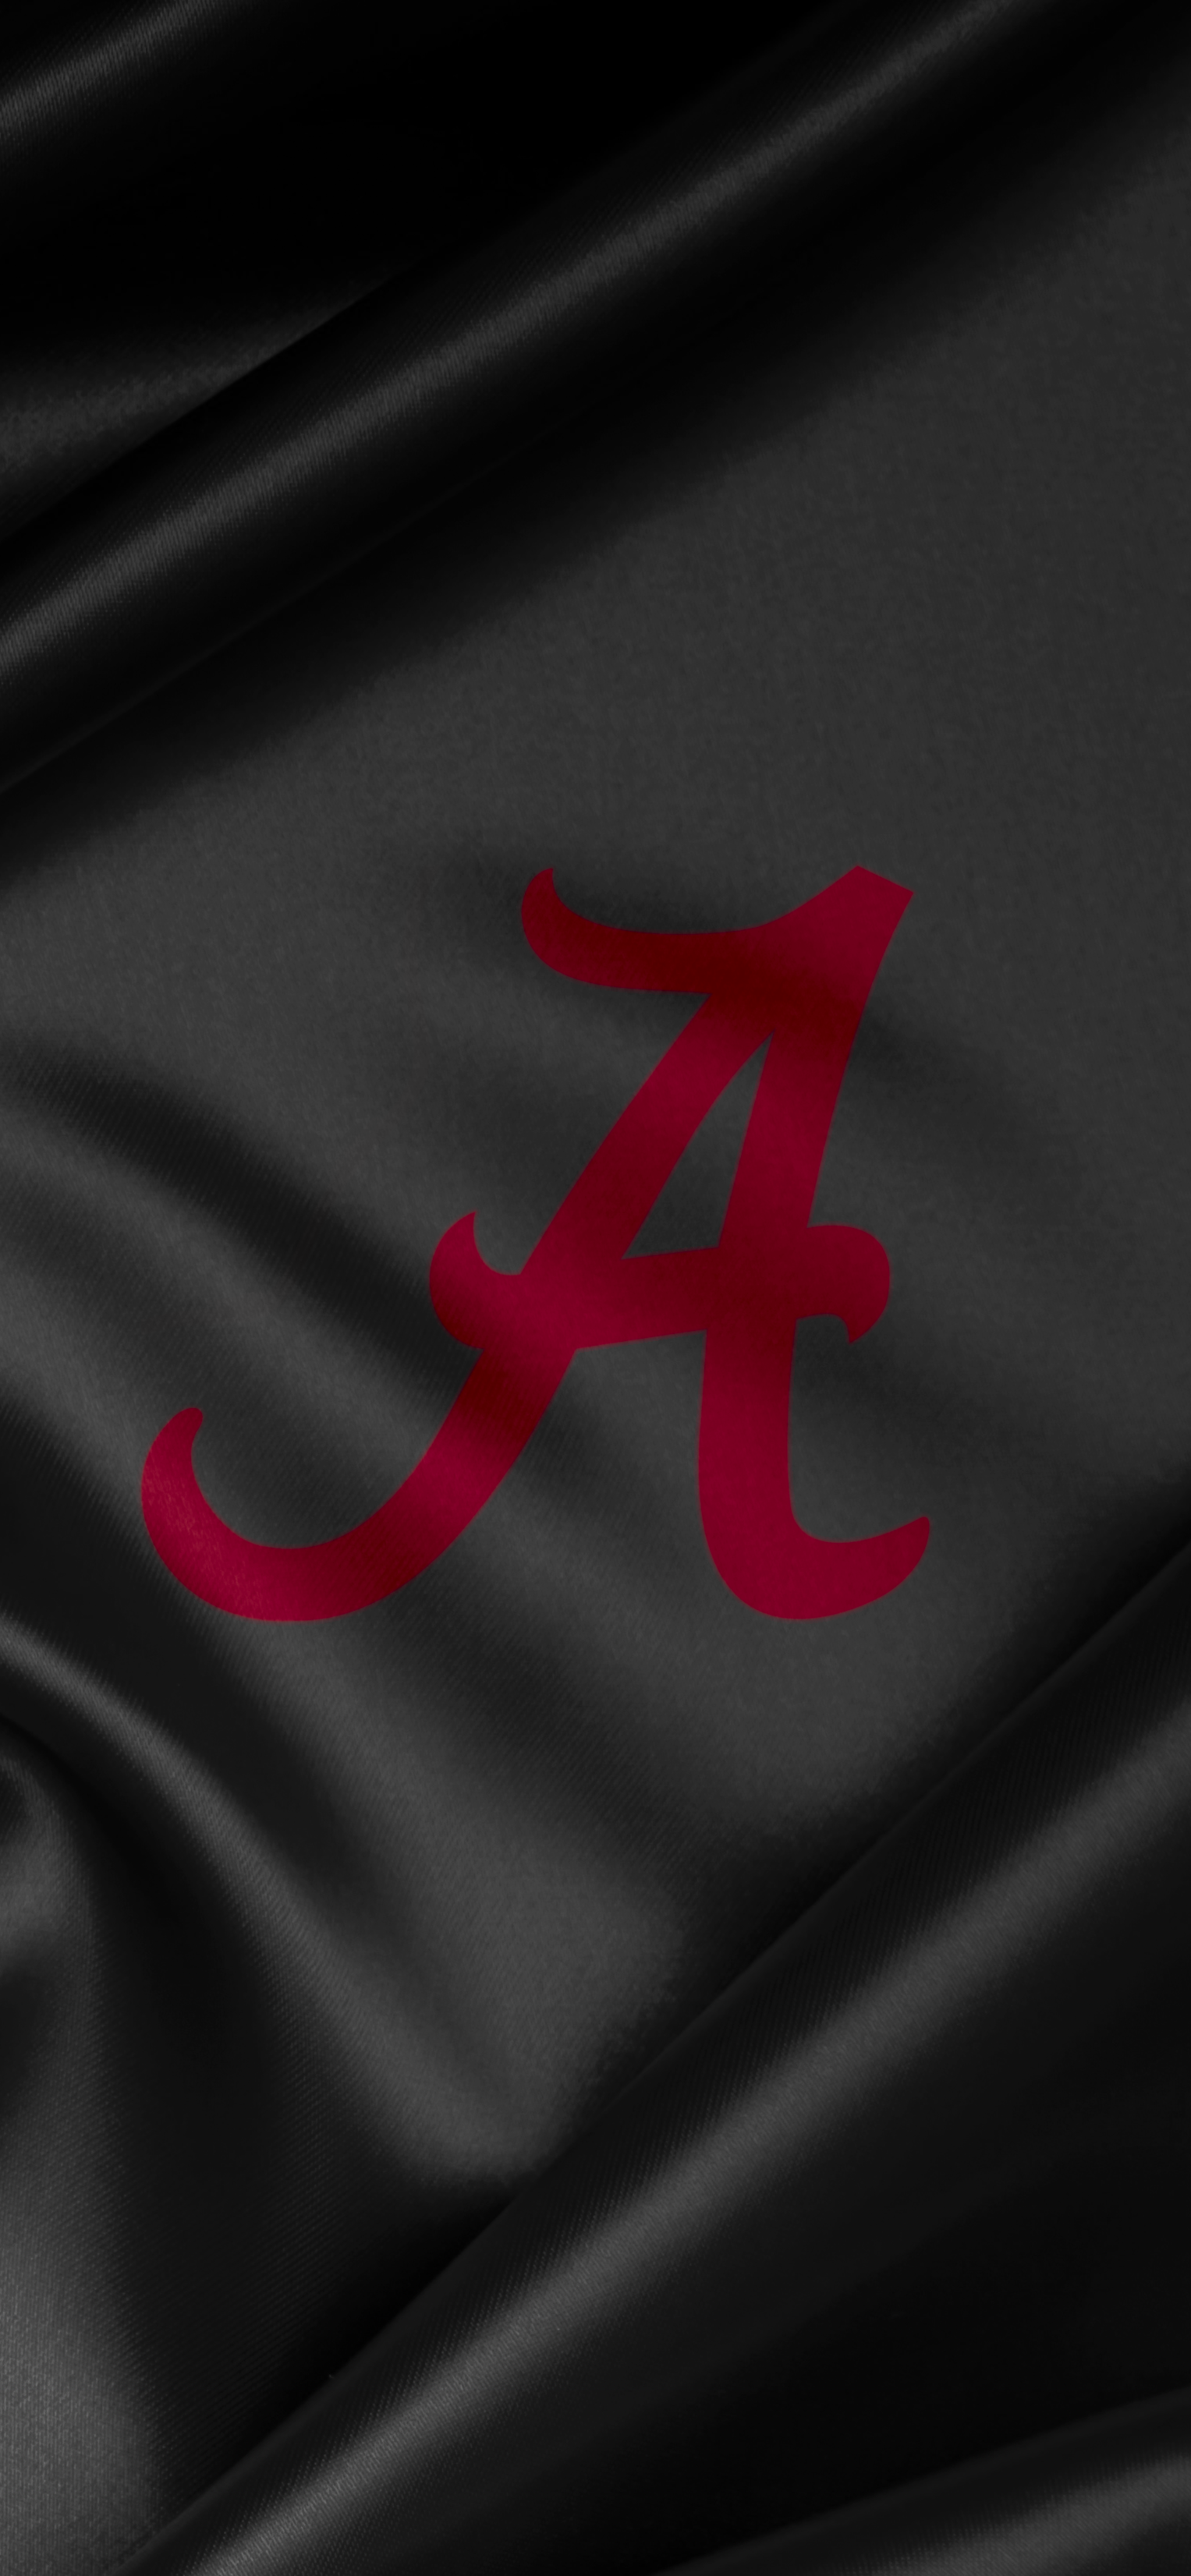 Silk 3 Alabama wallpaper, Alabama crimson tide football